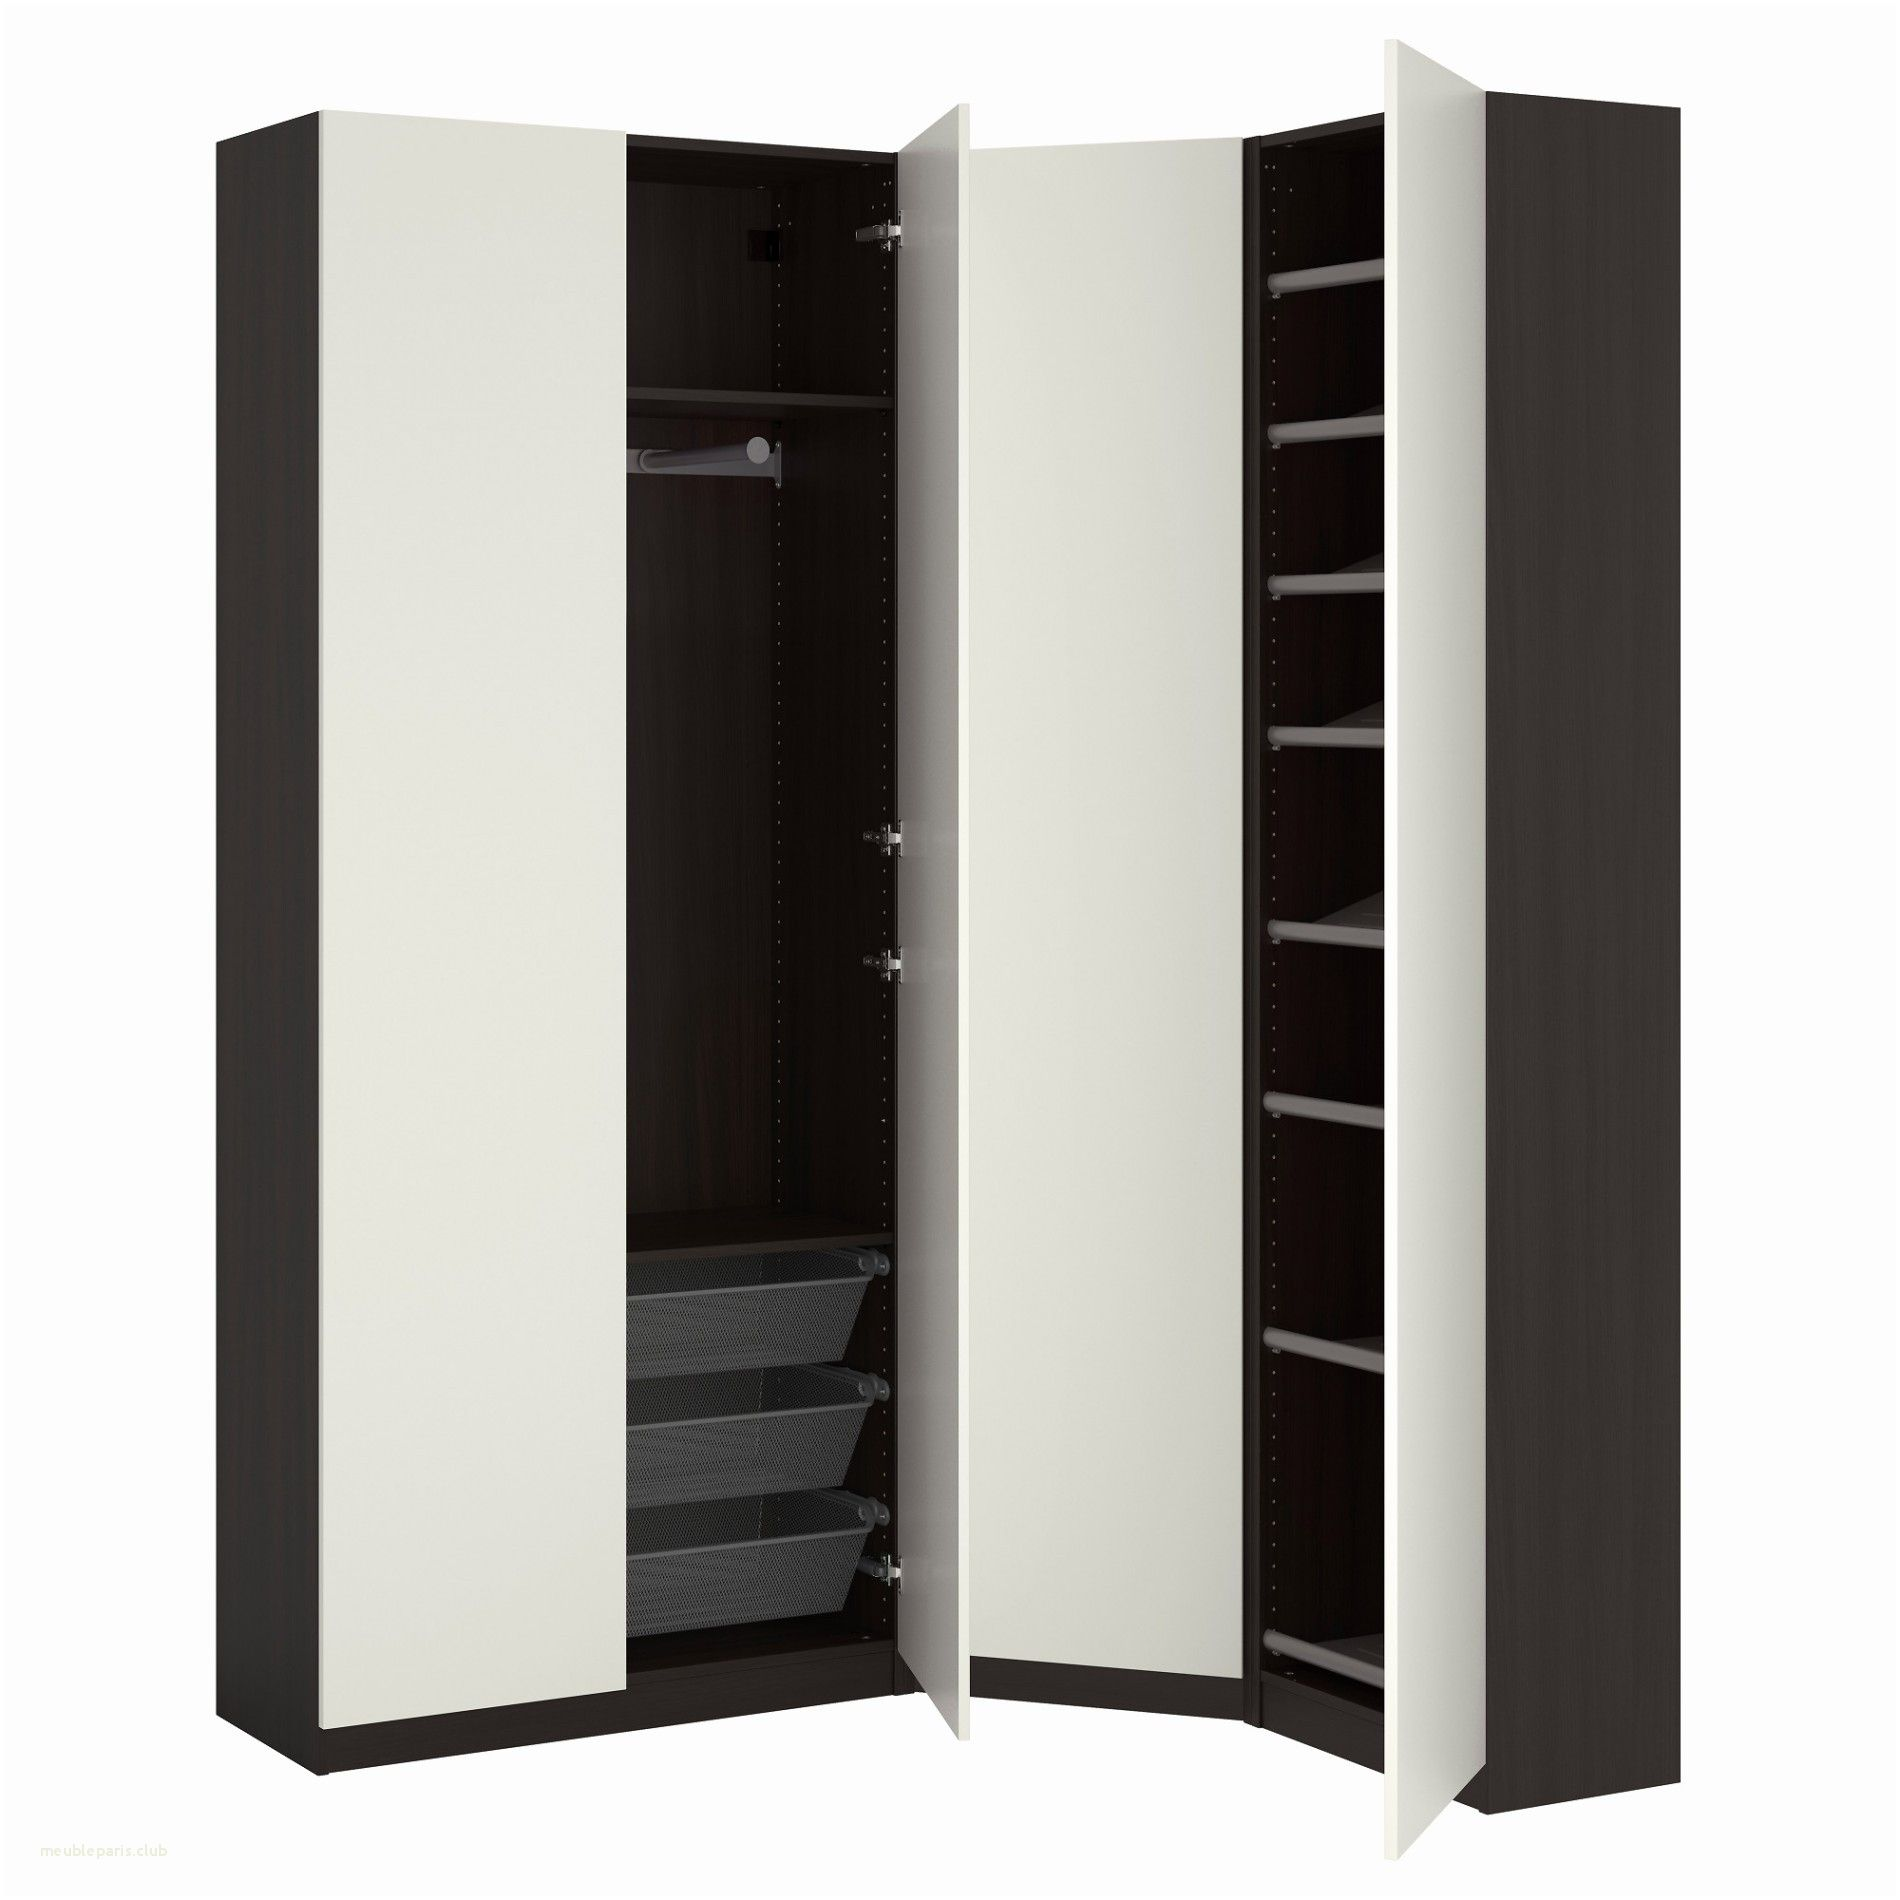 Armoire Bureau Porte Coulissante Armoire Bureau Porte Coulissante Guide Porte Coulissante Achat Vente Pas Tall Cabinet Storage Locker Storage Cool Furniture